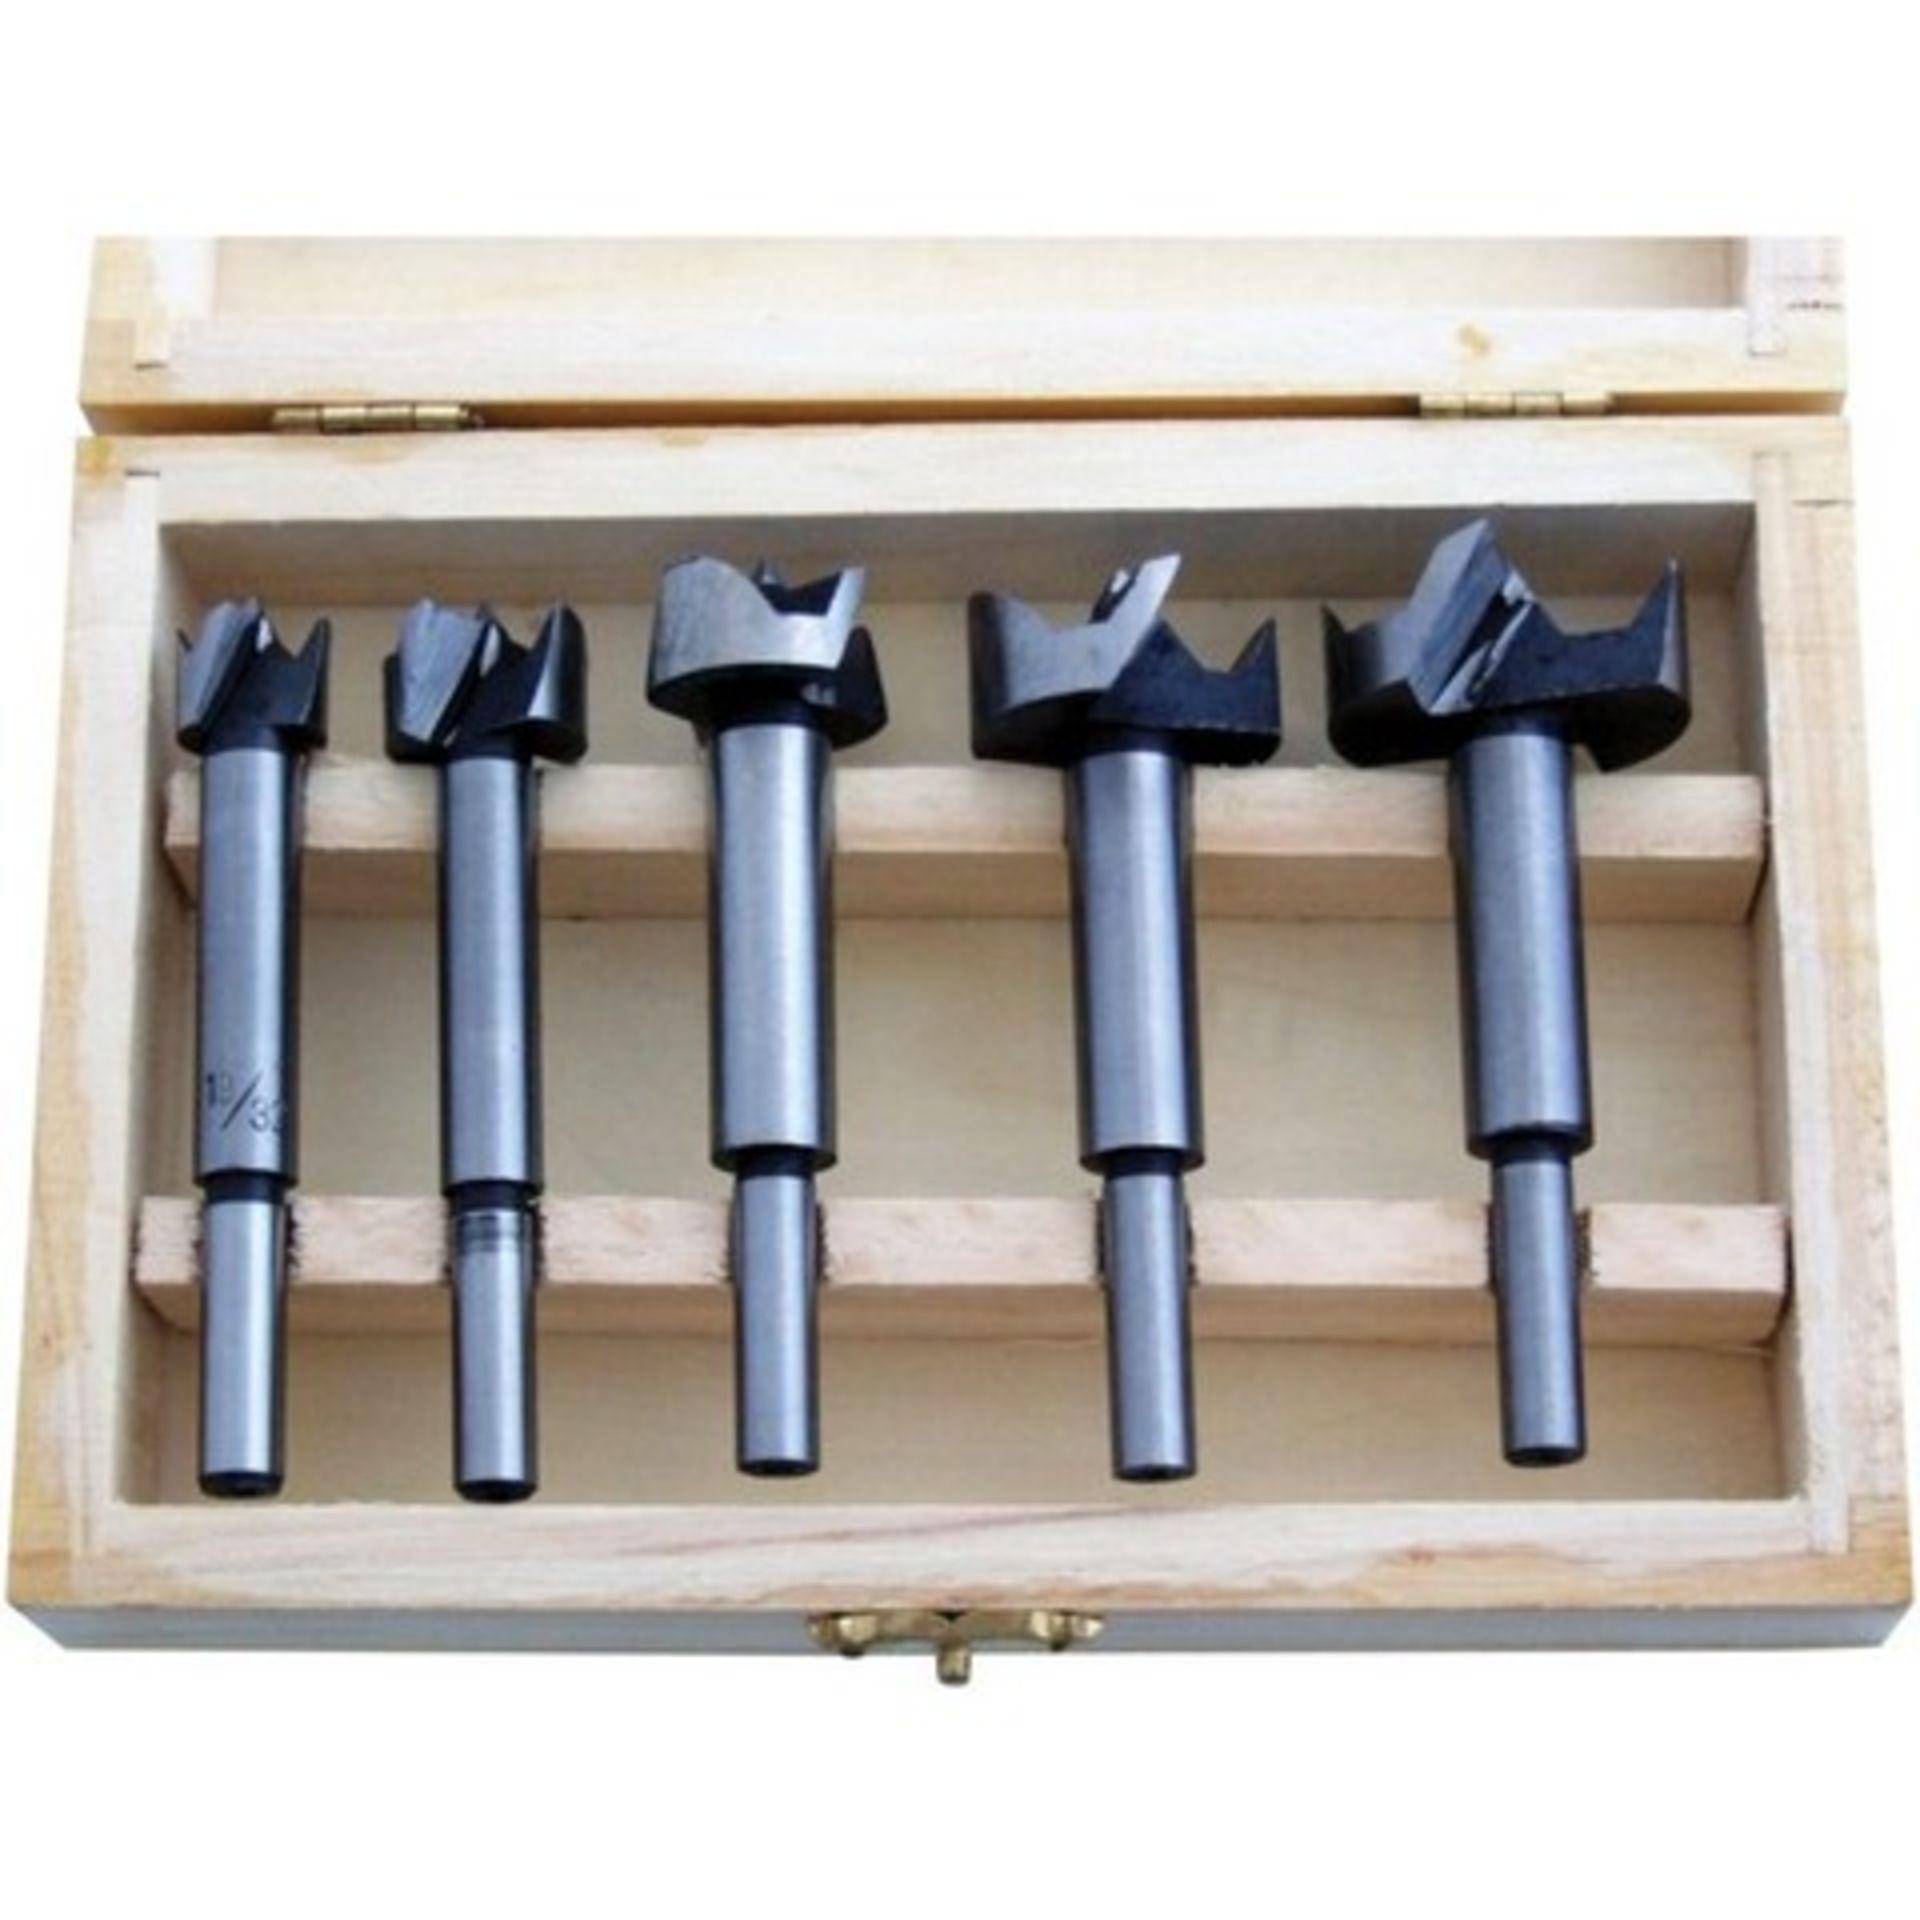 Lot 12575 - V Brand New 5 Piece Forstner Bit Set In Wooden Case